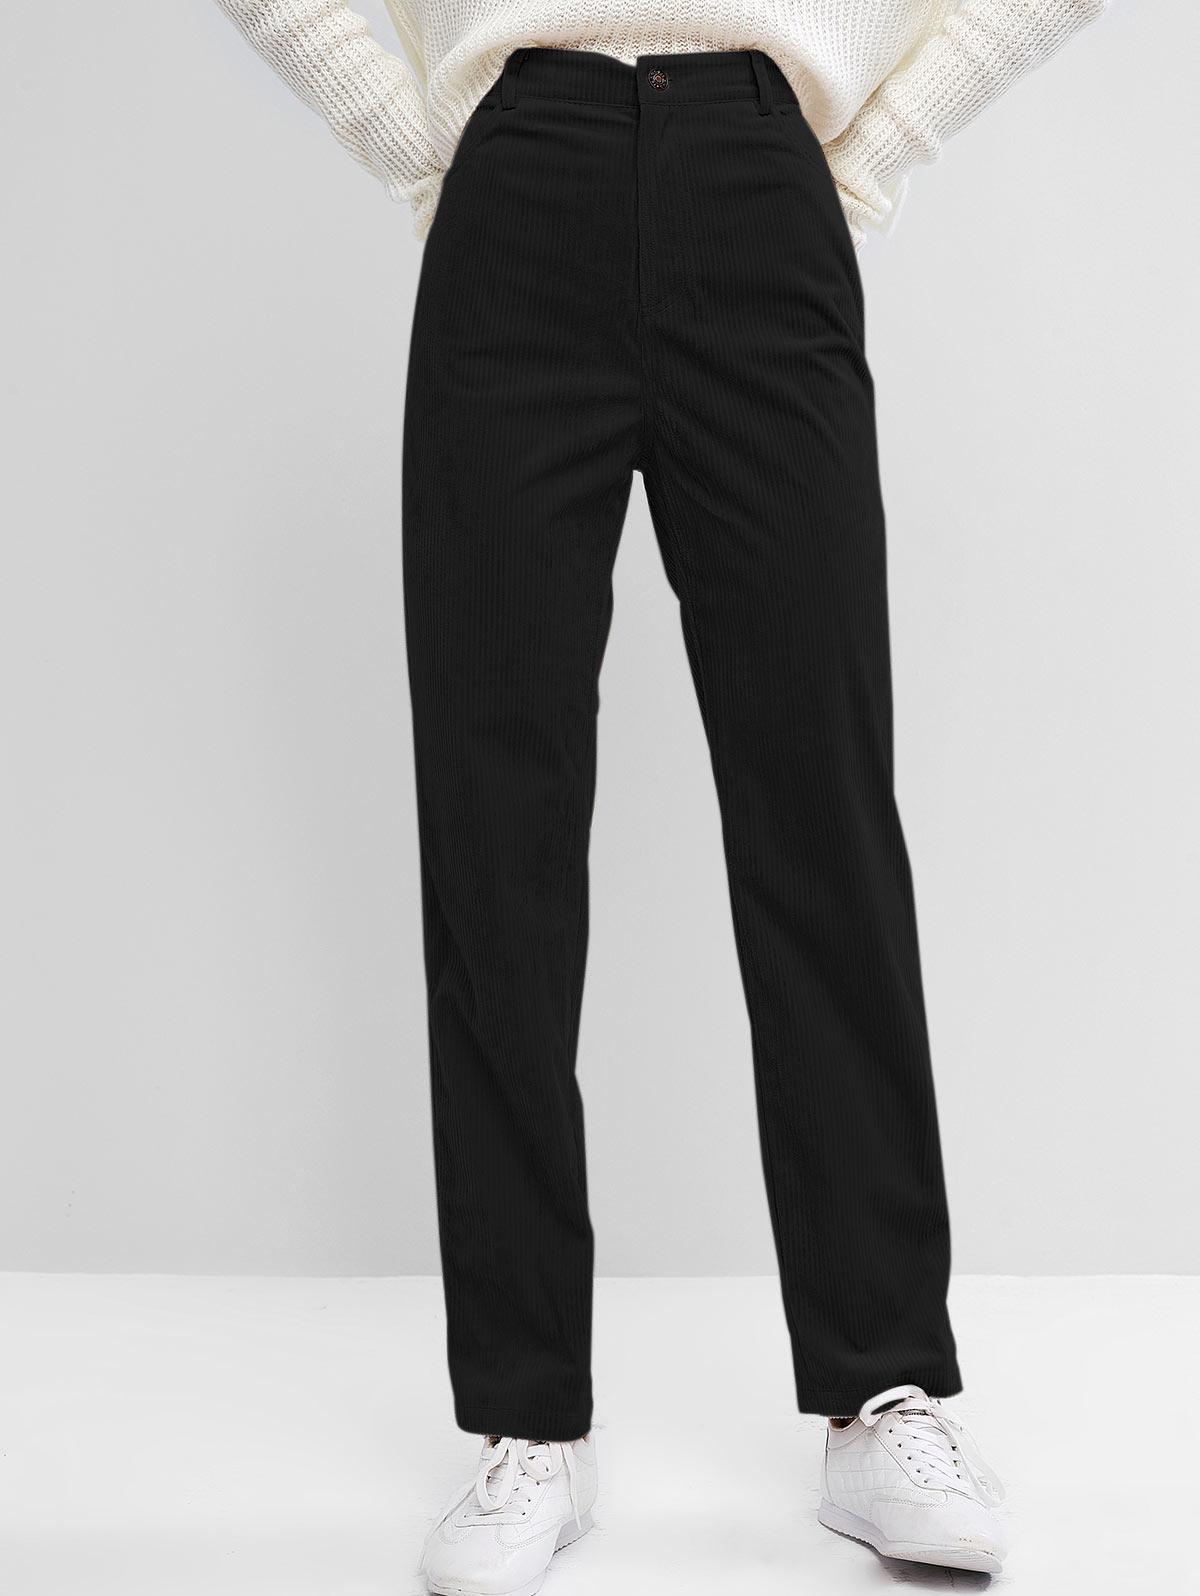 ZAFUL High Waisted Corduroy Pants